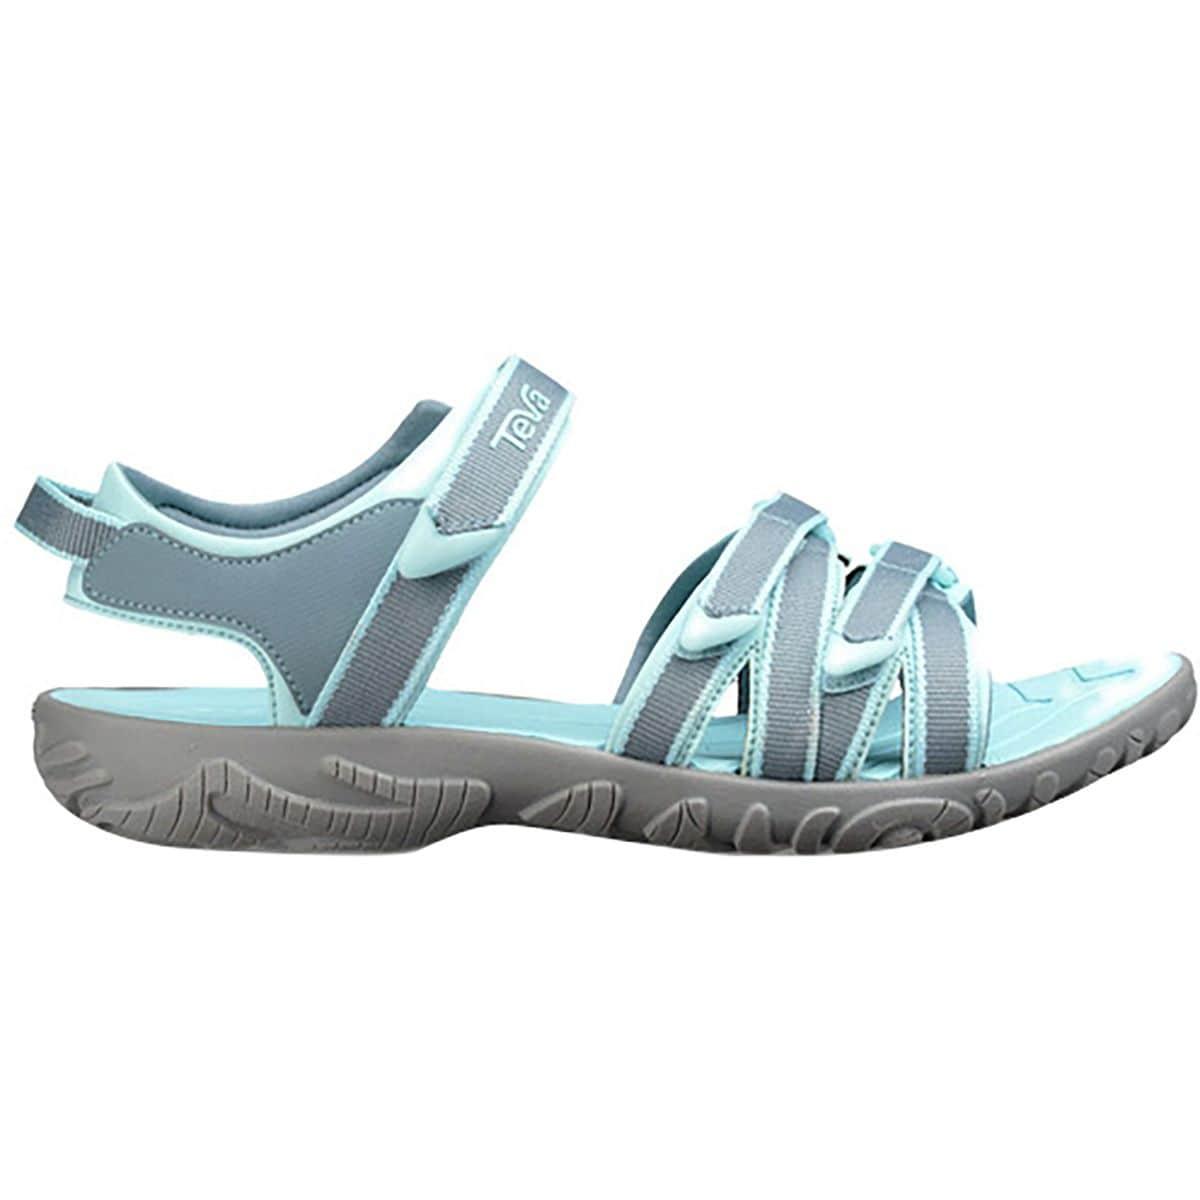 35caace16382 Teva Tirra Sandal Girls Citadel 50